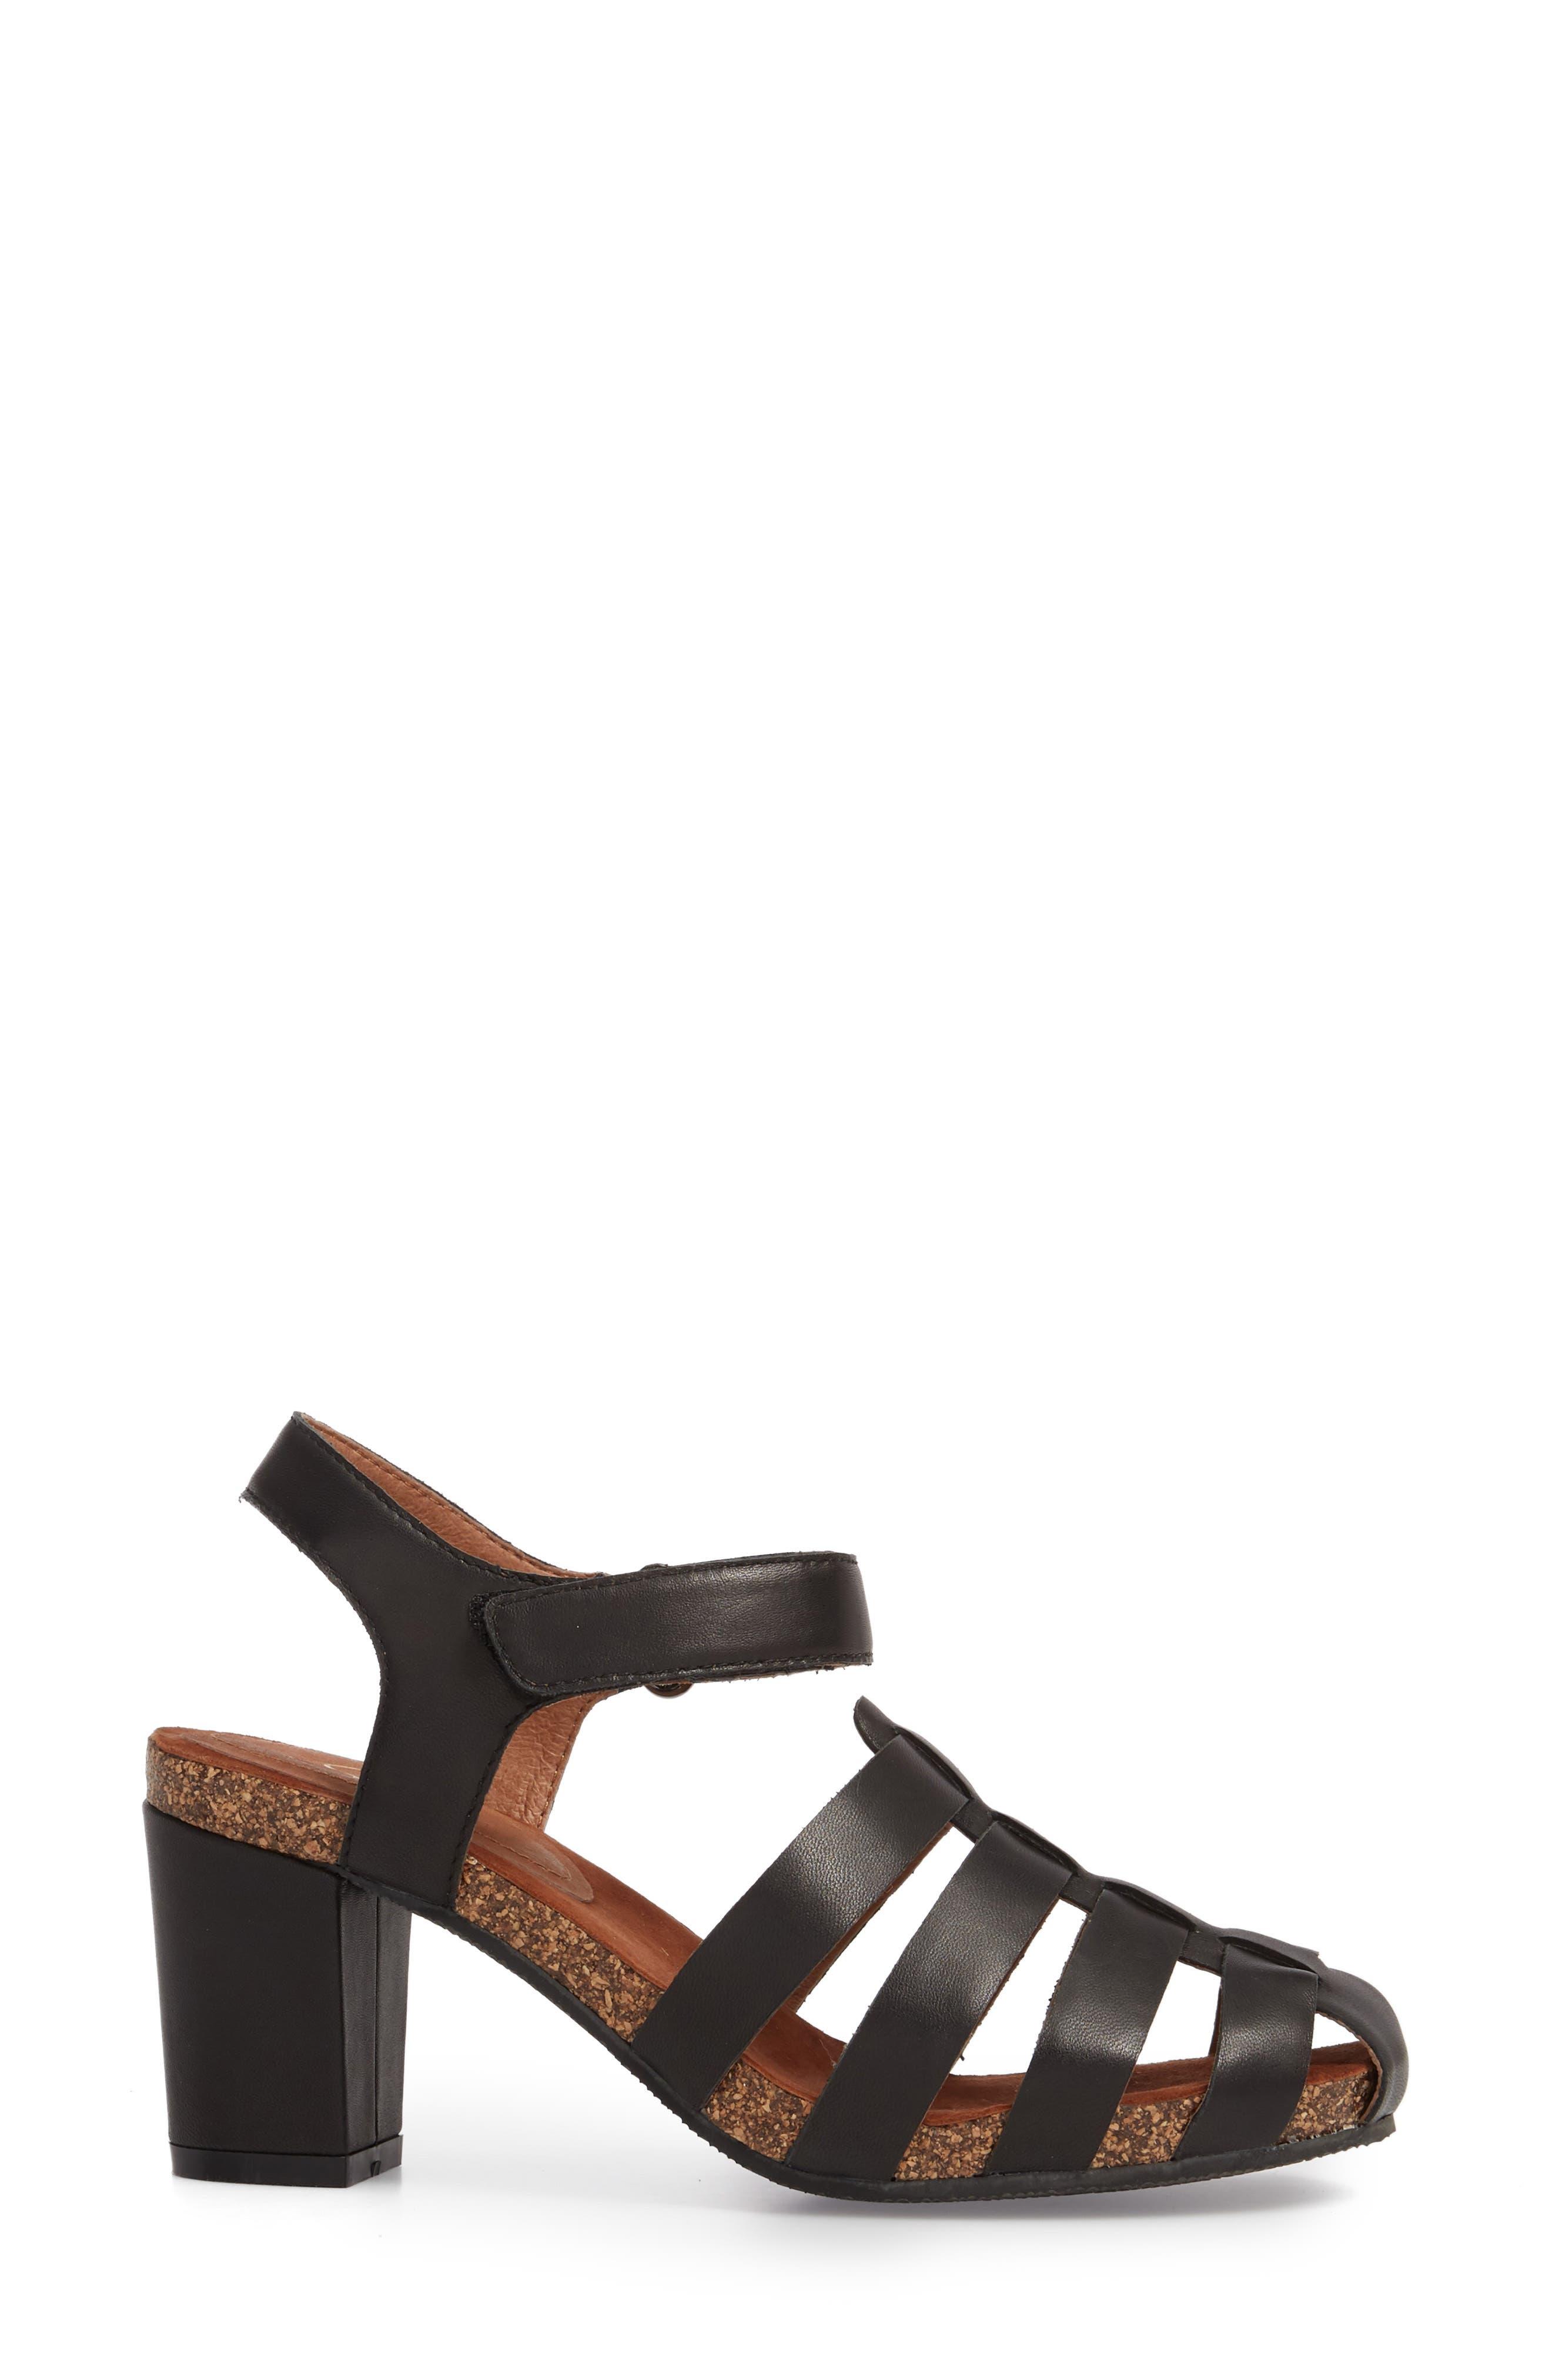 Carrara Block Heel Sandal,                             Alternate thumbnail 3, color,                             BLACK LEATHER